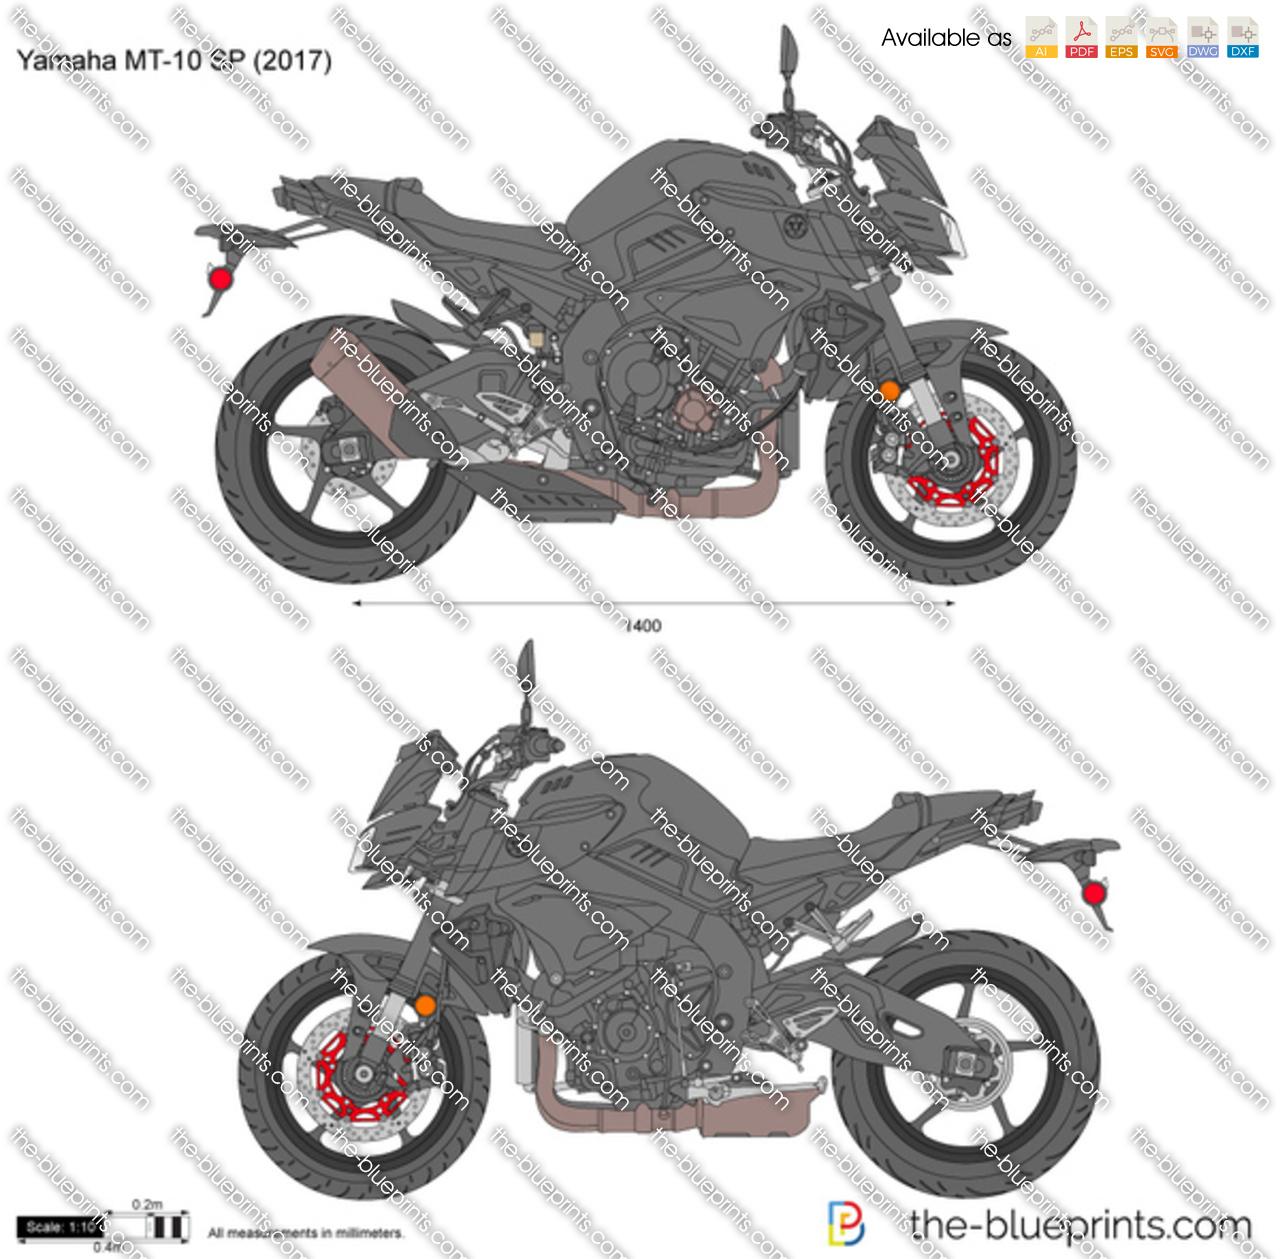 Yamaha MT-10 SP vector drawing